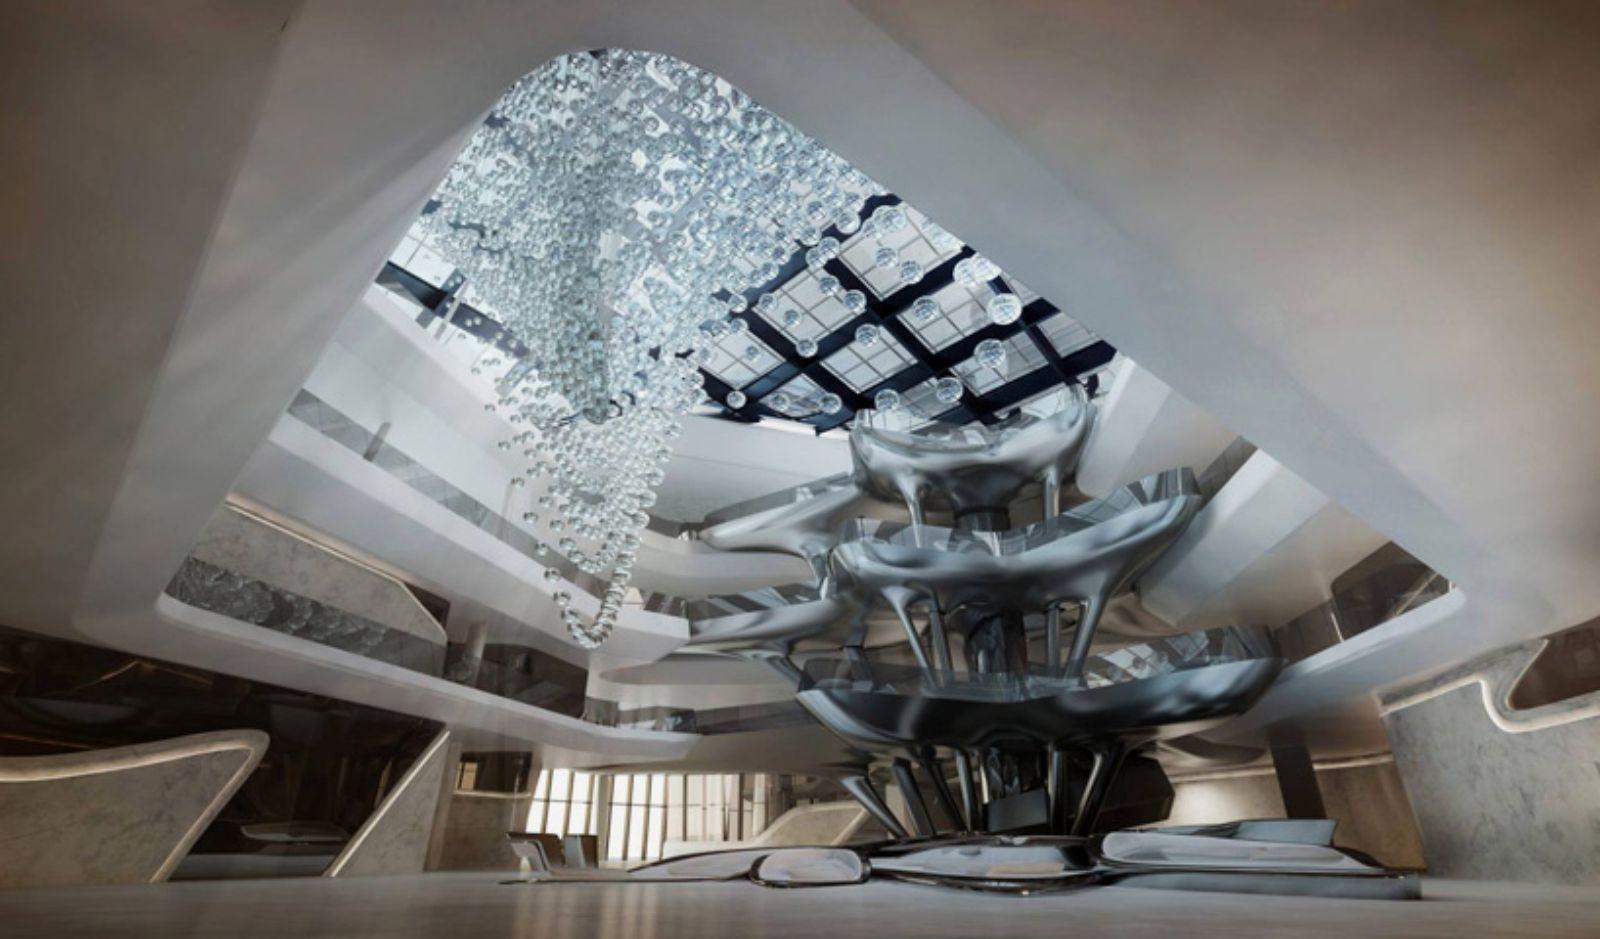 Me Hotel - Atrium and Vertical cafe by Zaha Hadid | Atrium | Pinterest